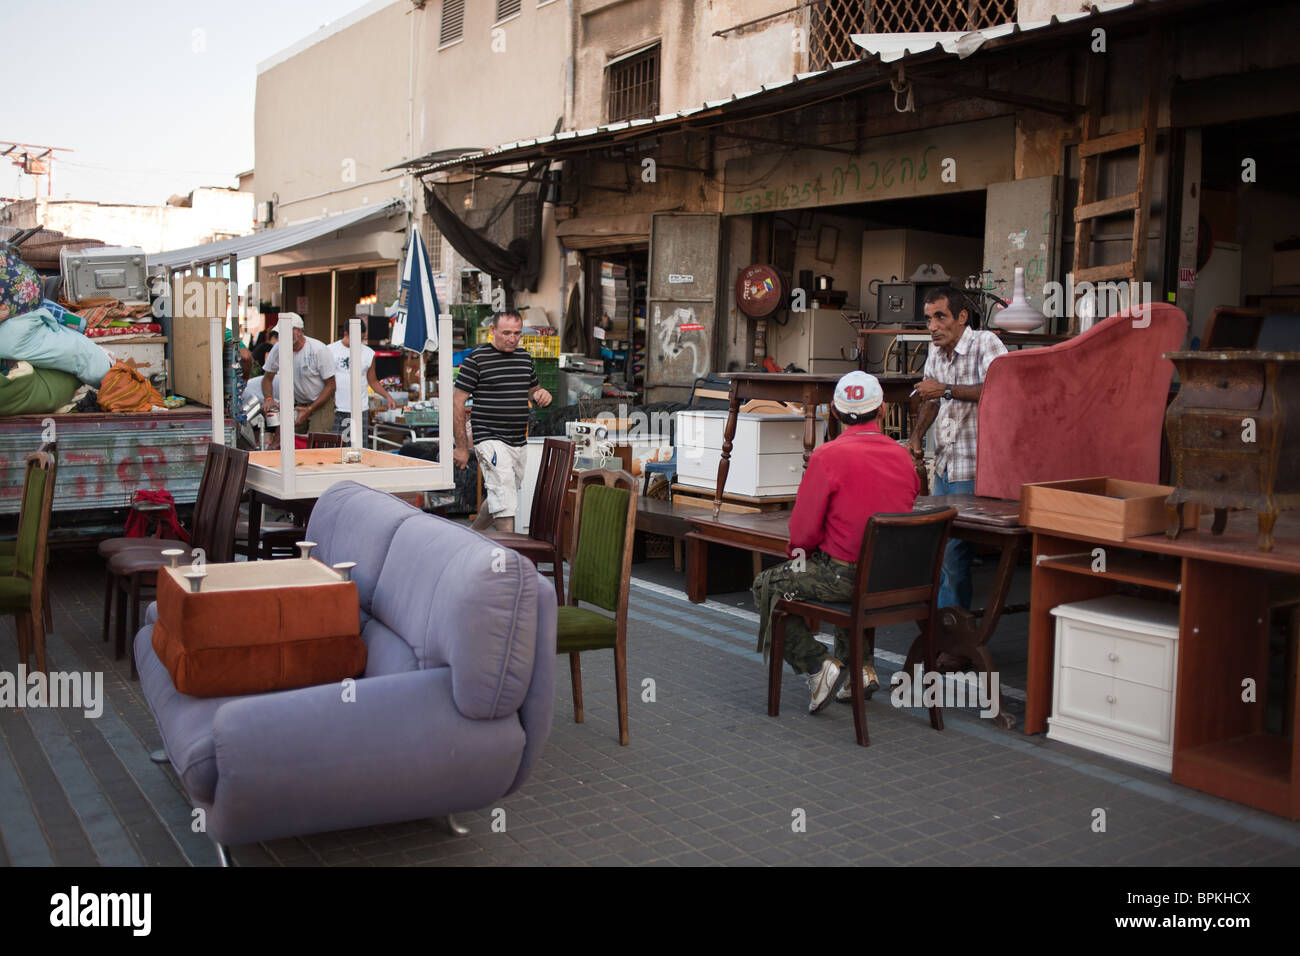 Flea Market Furniture Stockfotos & Flea Market Furniture Bilder - Alamy